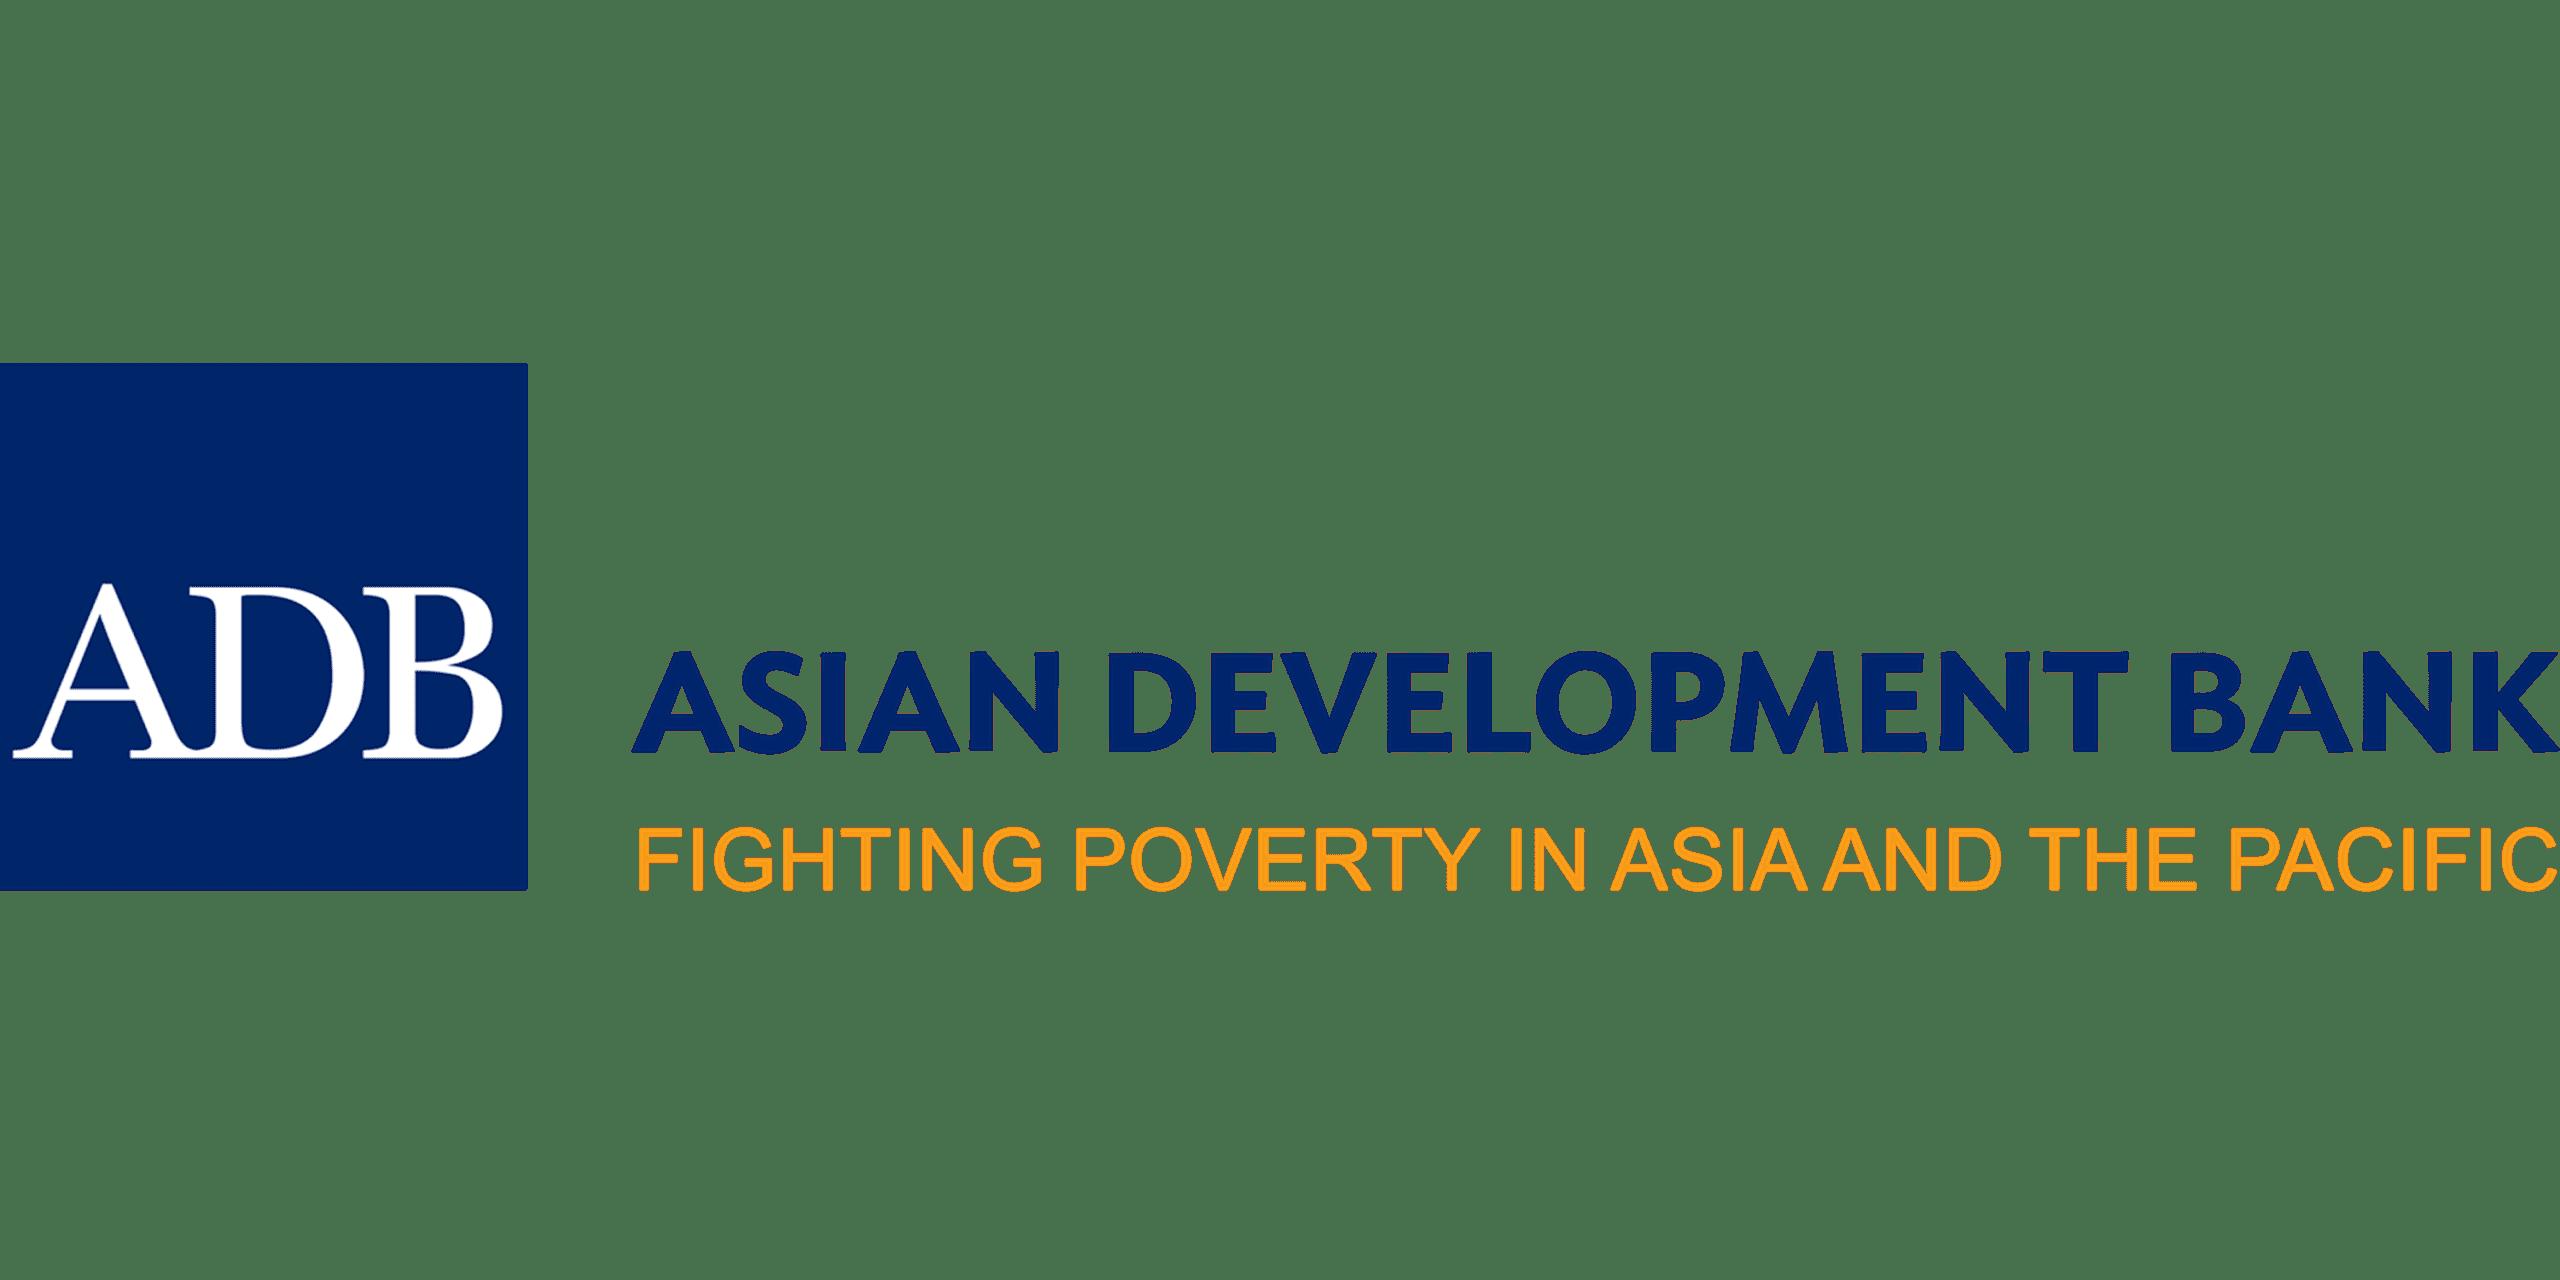 Asian Development Bank (ADB) logo